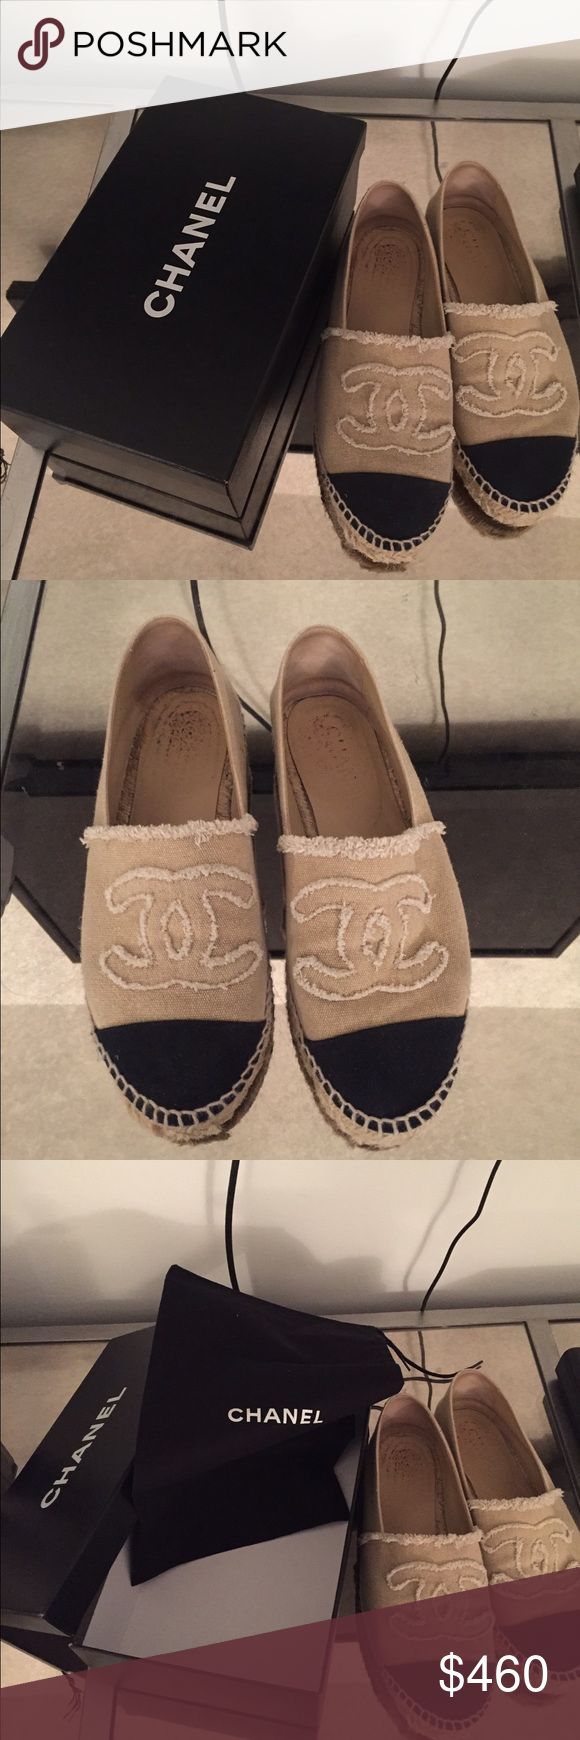 Chanel Espadrilles Authentic Chanel Espadrilles. I have box and dust bag. Size 8 CHANEL Shoes Espadrilles